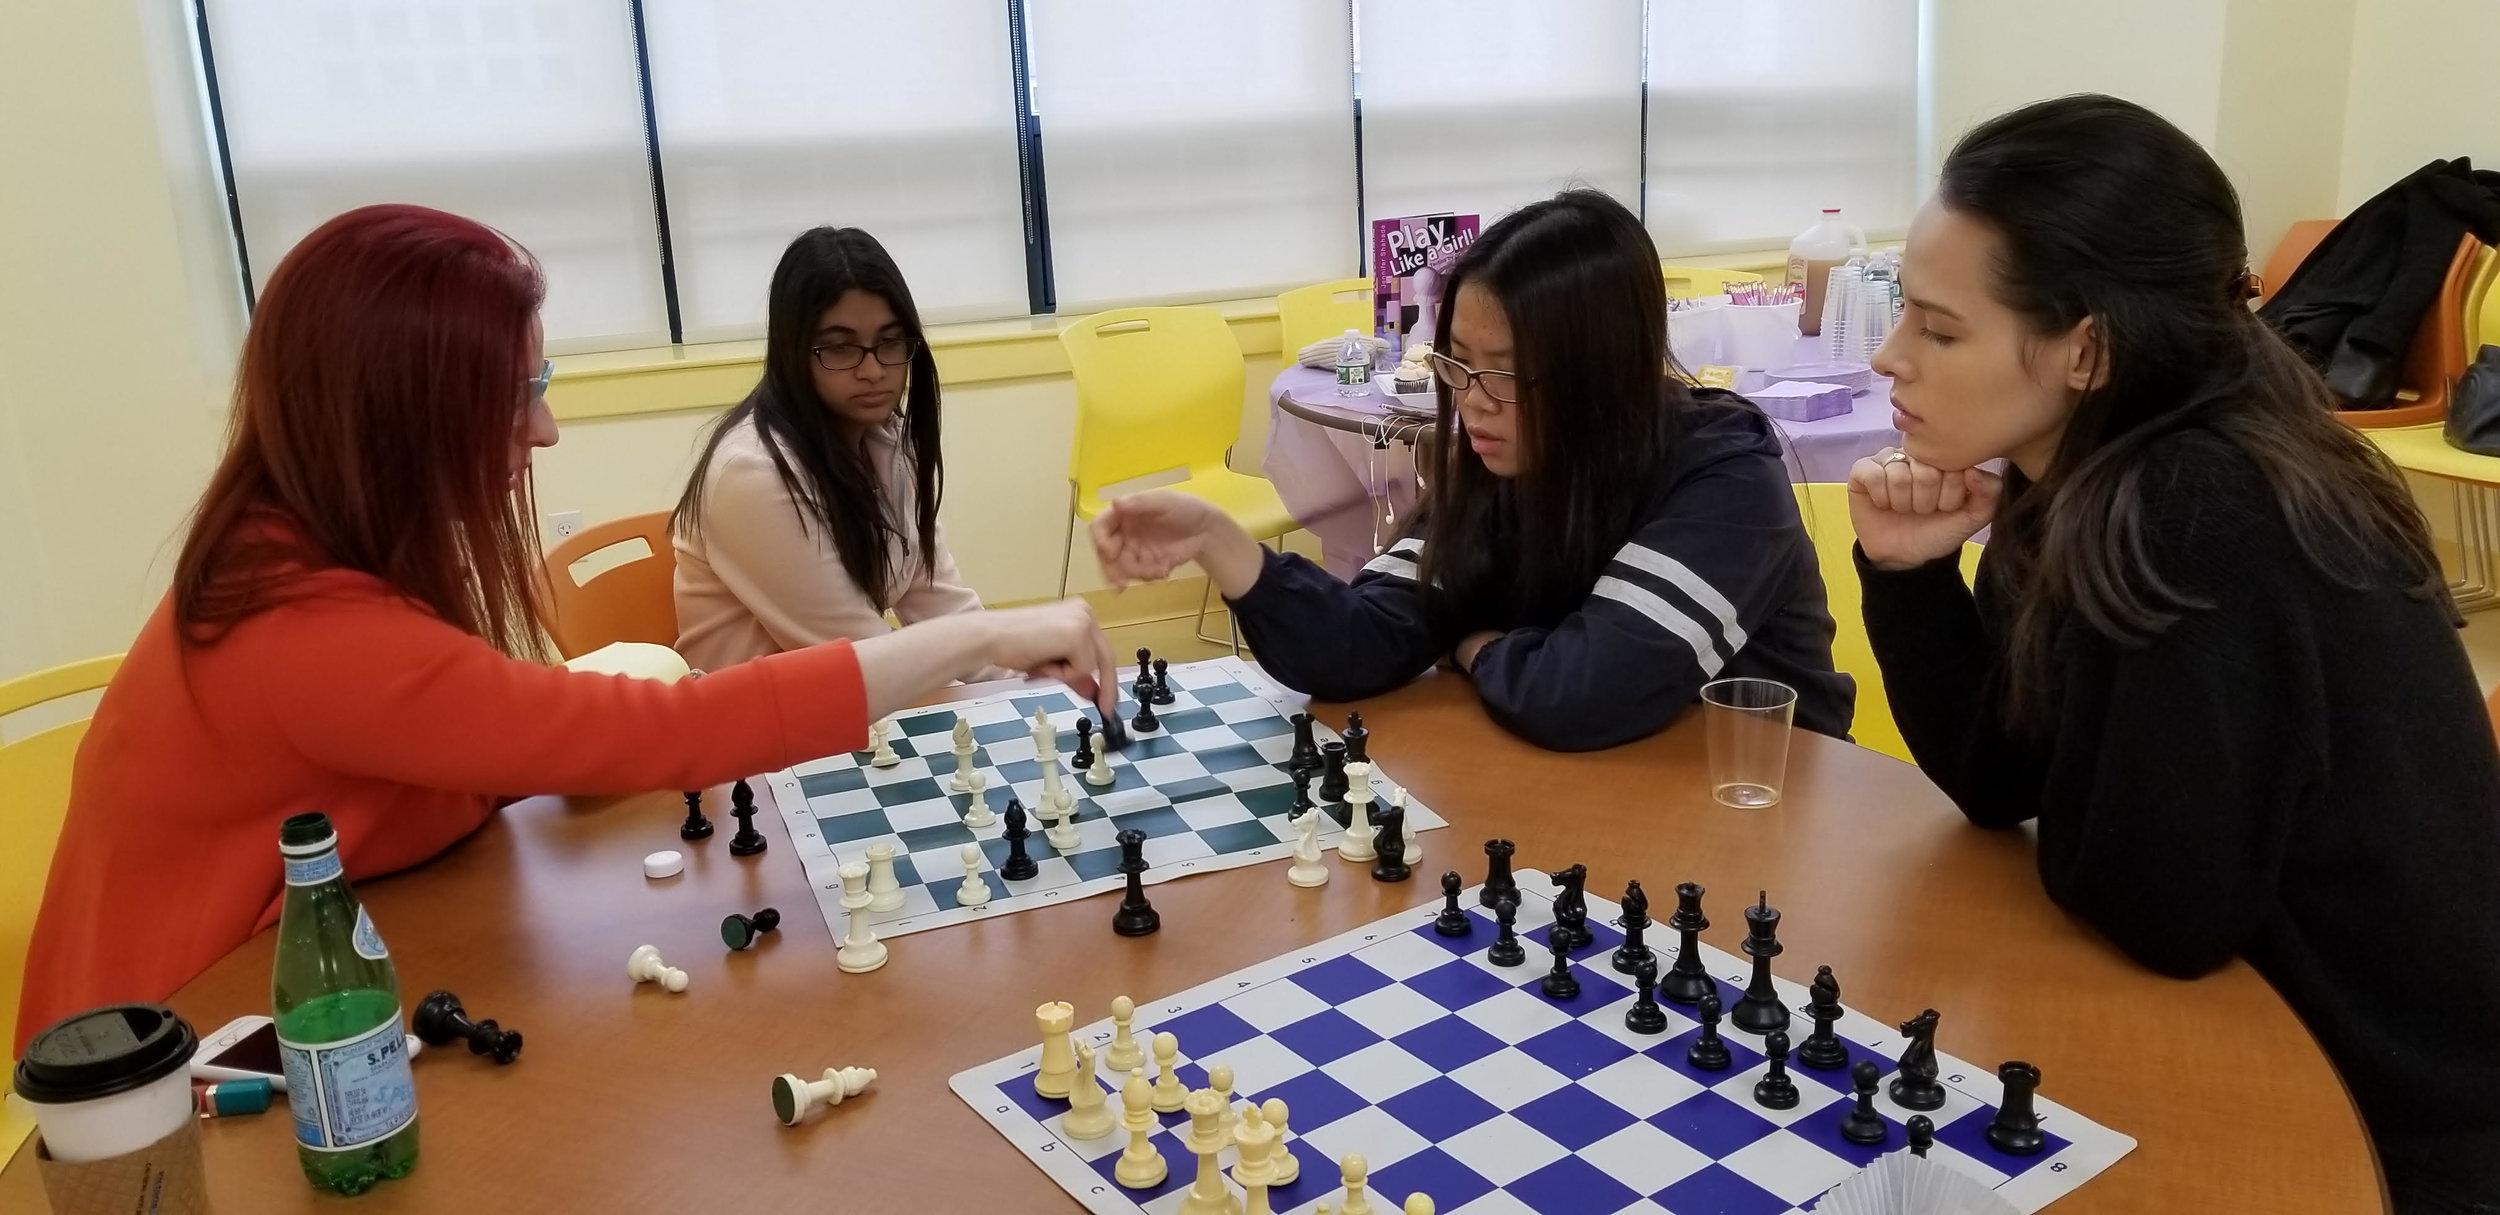 Woman Grandmaster and former U.S. Women's Champion Jennifer Shahade analyzes at Magnus League